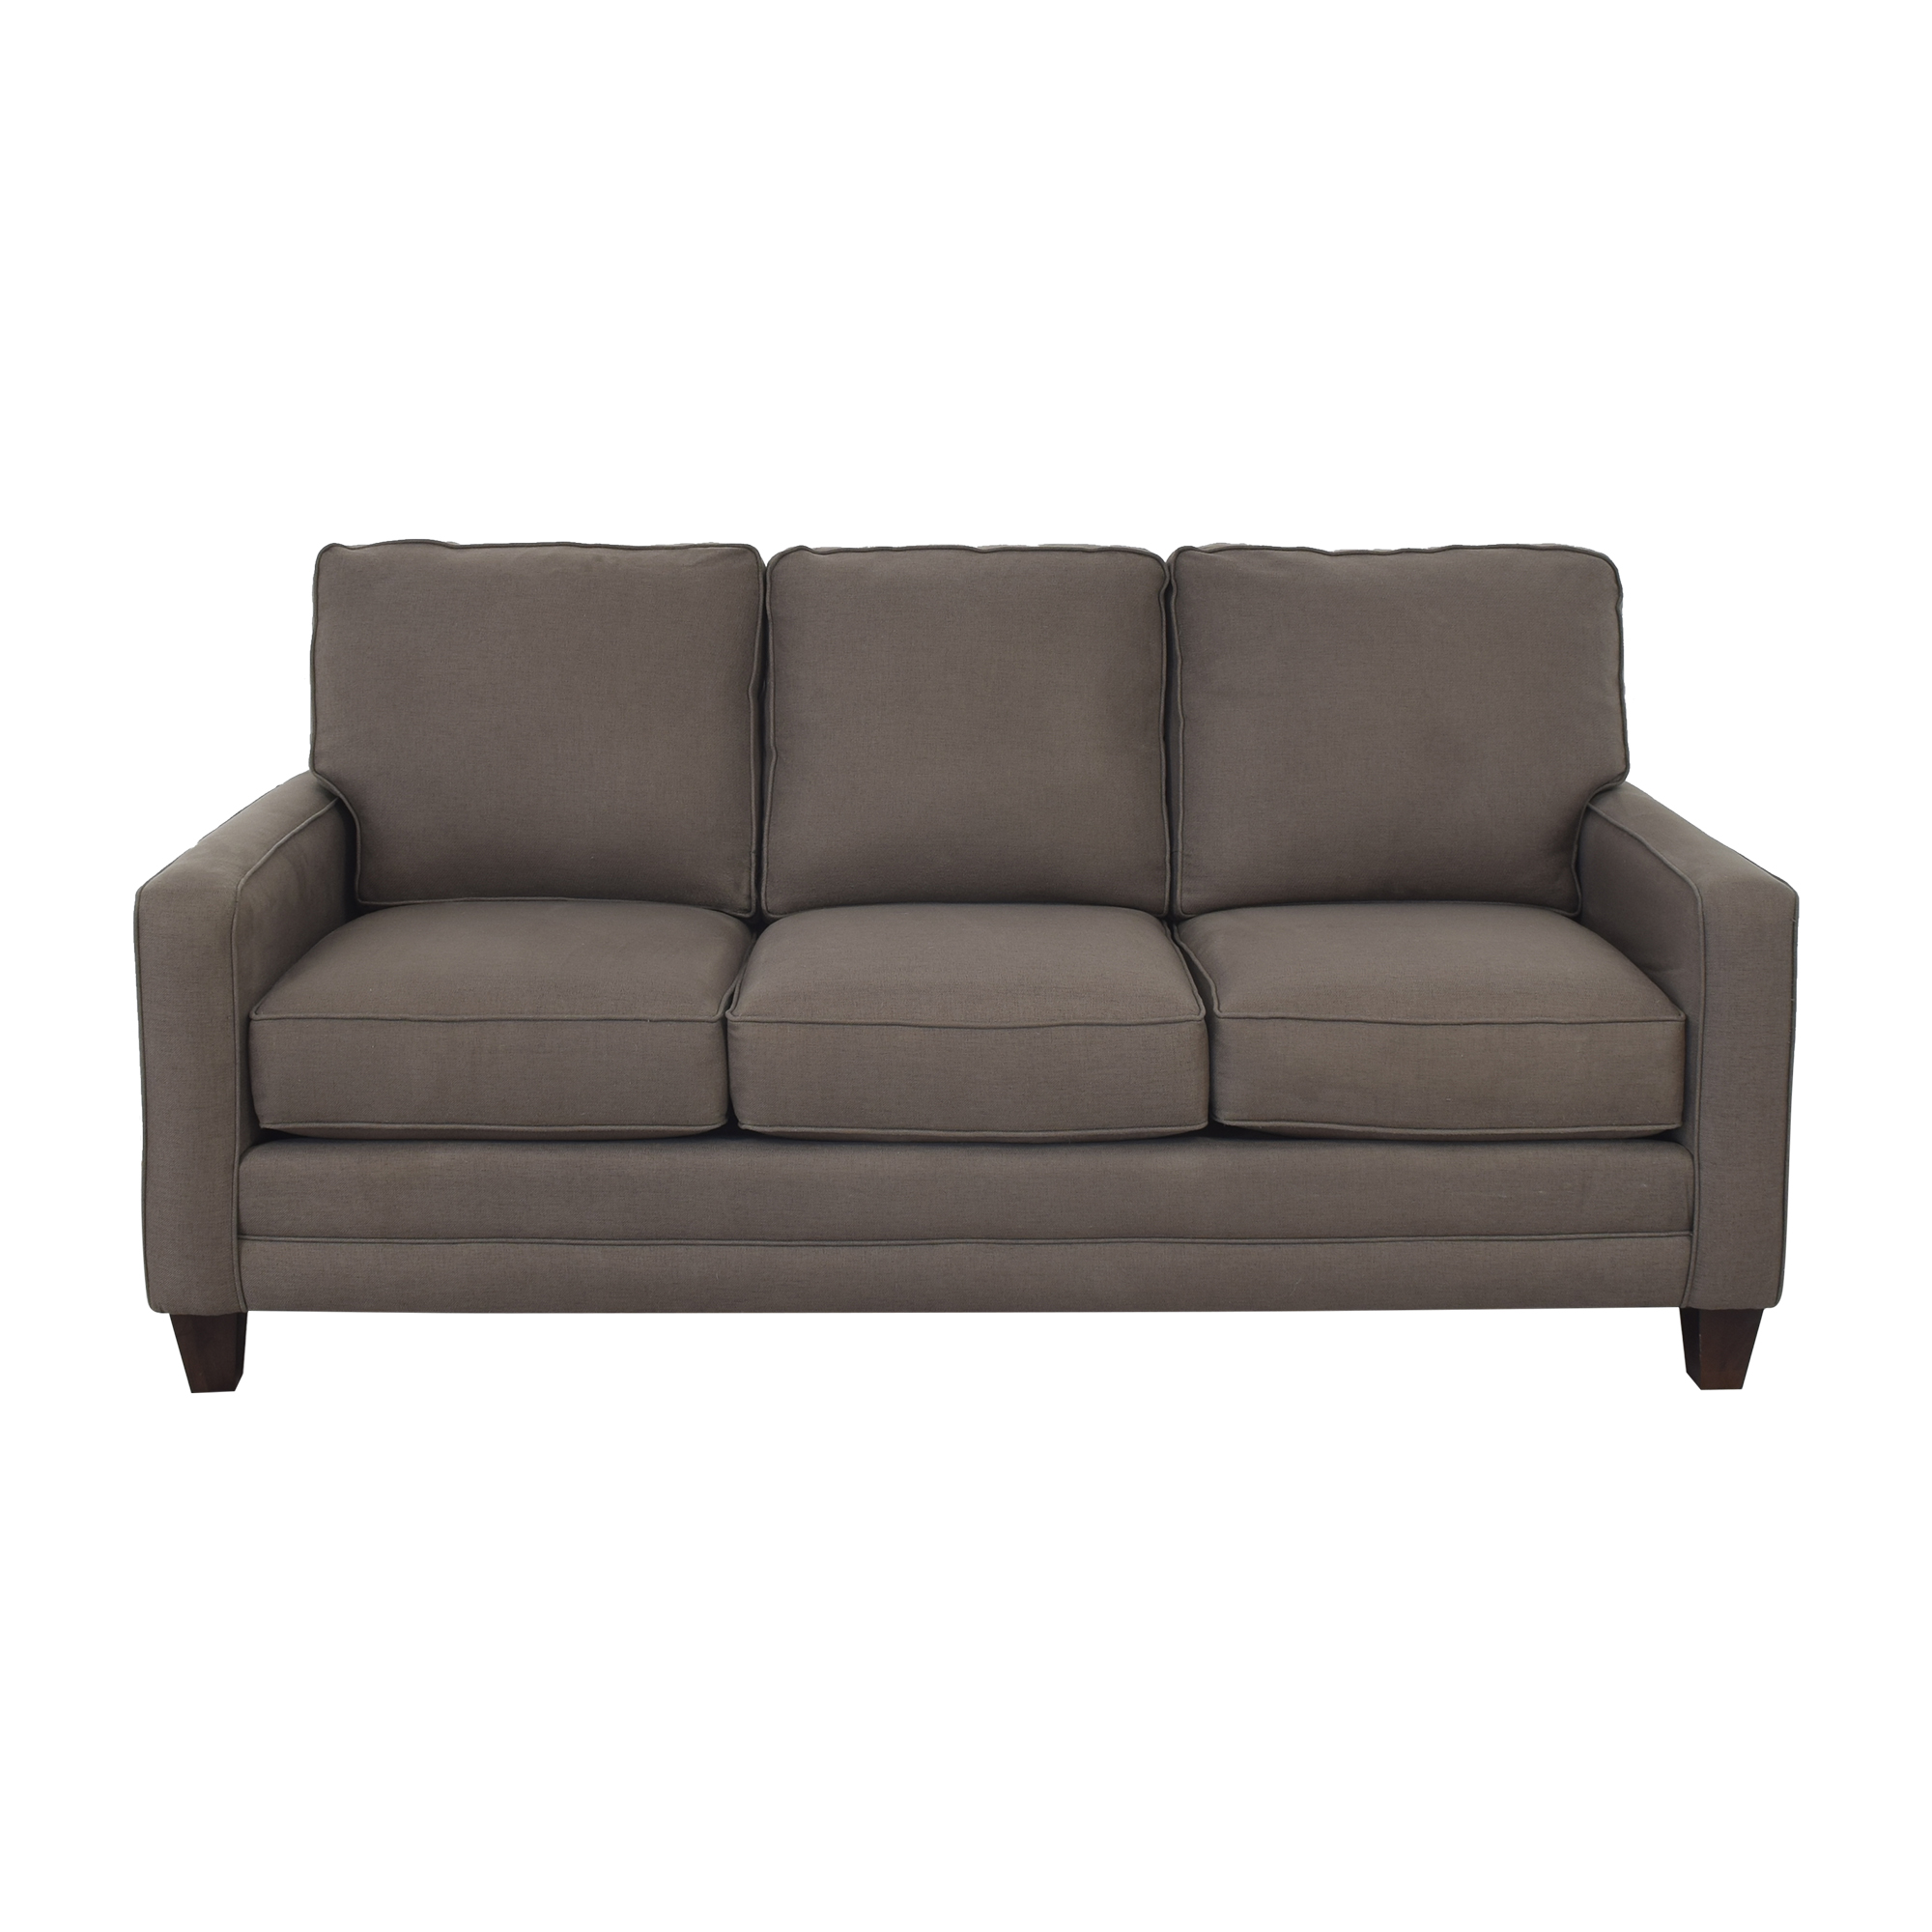 Bassett Furniture Bassett Furniture Alexander Track Arm Sofa for sale